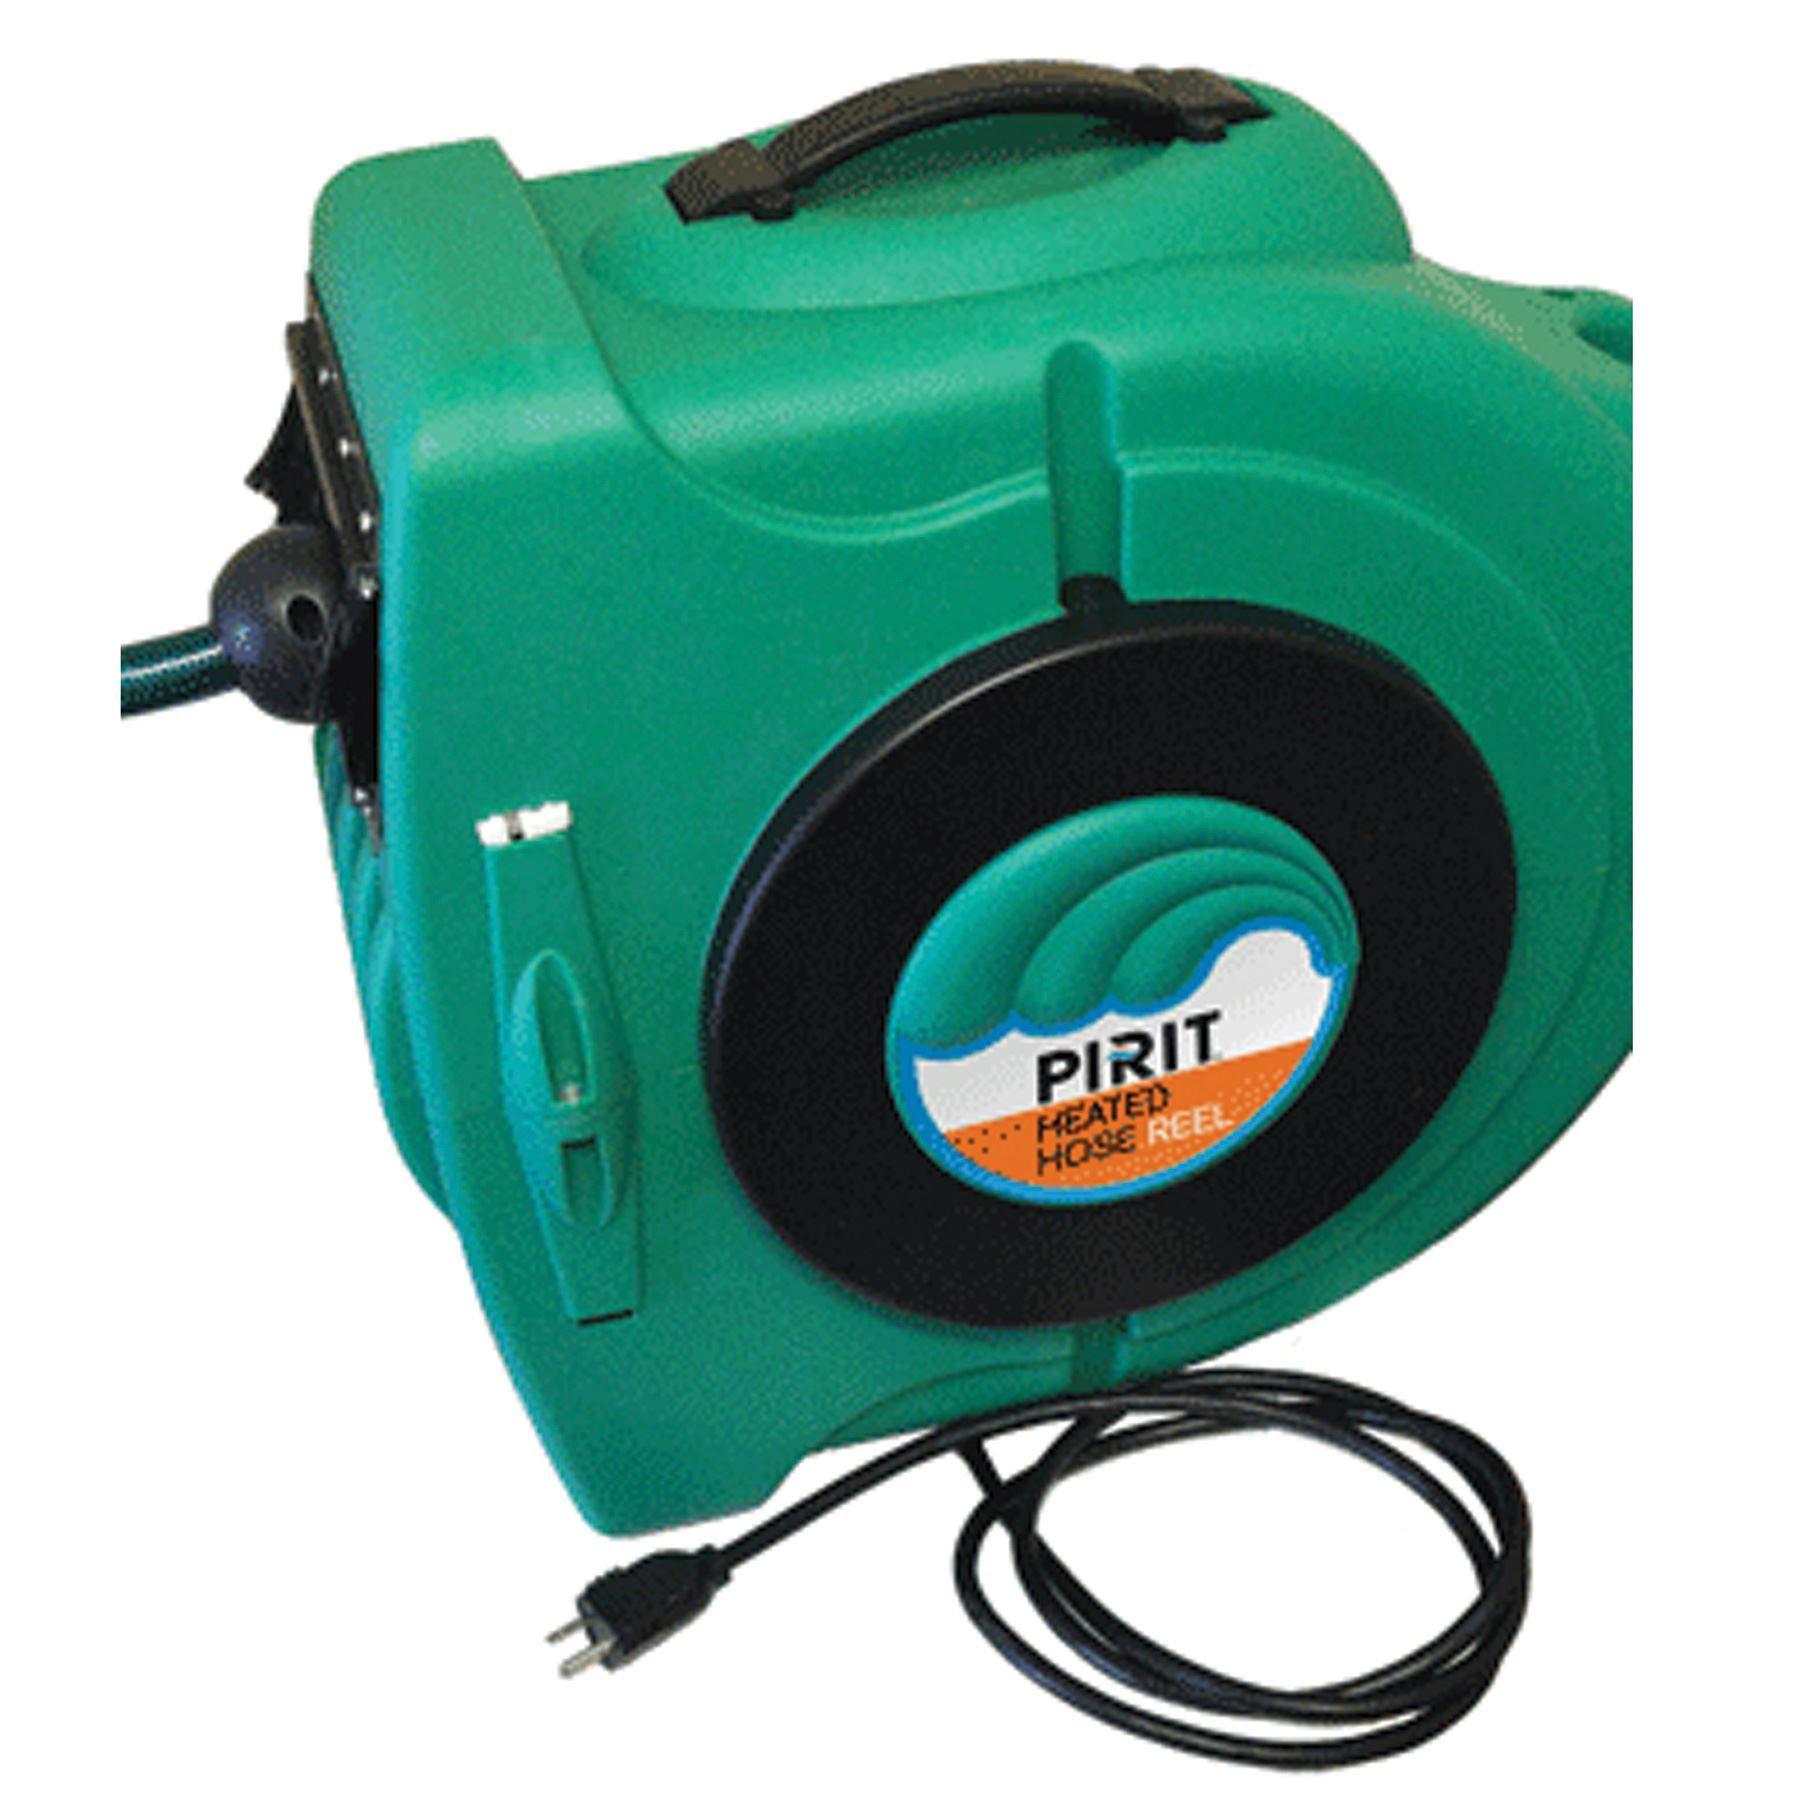 pirit heated hose instructions